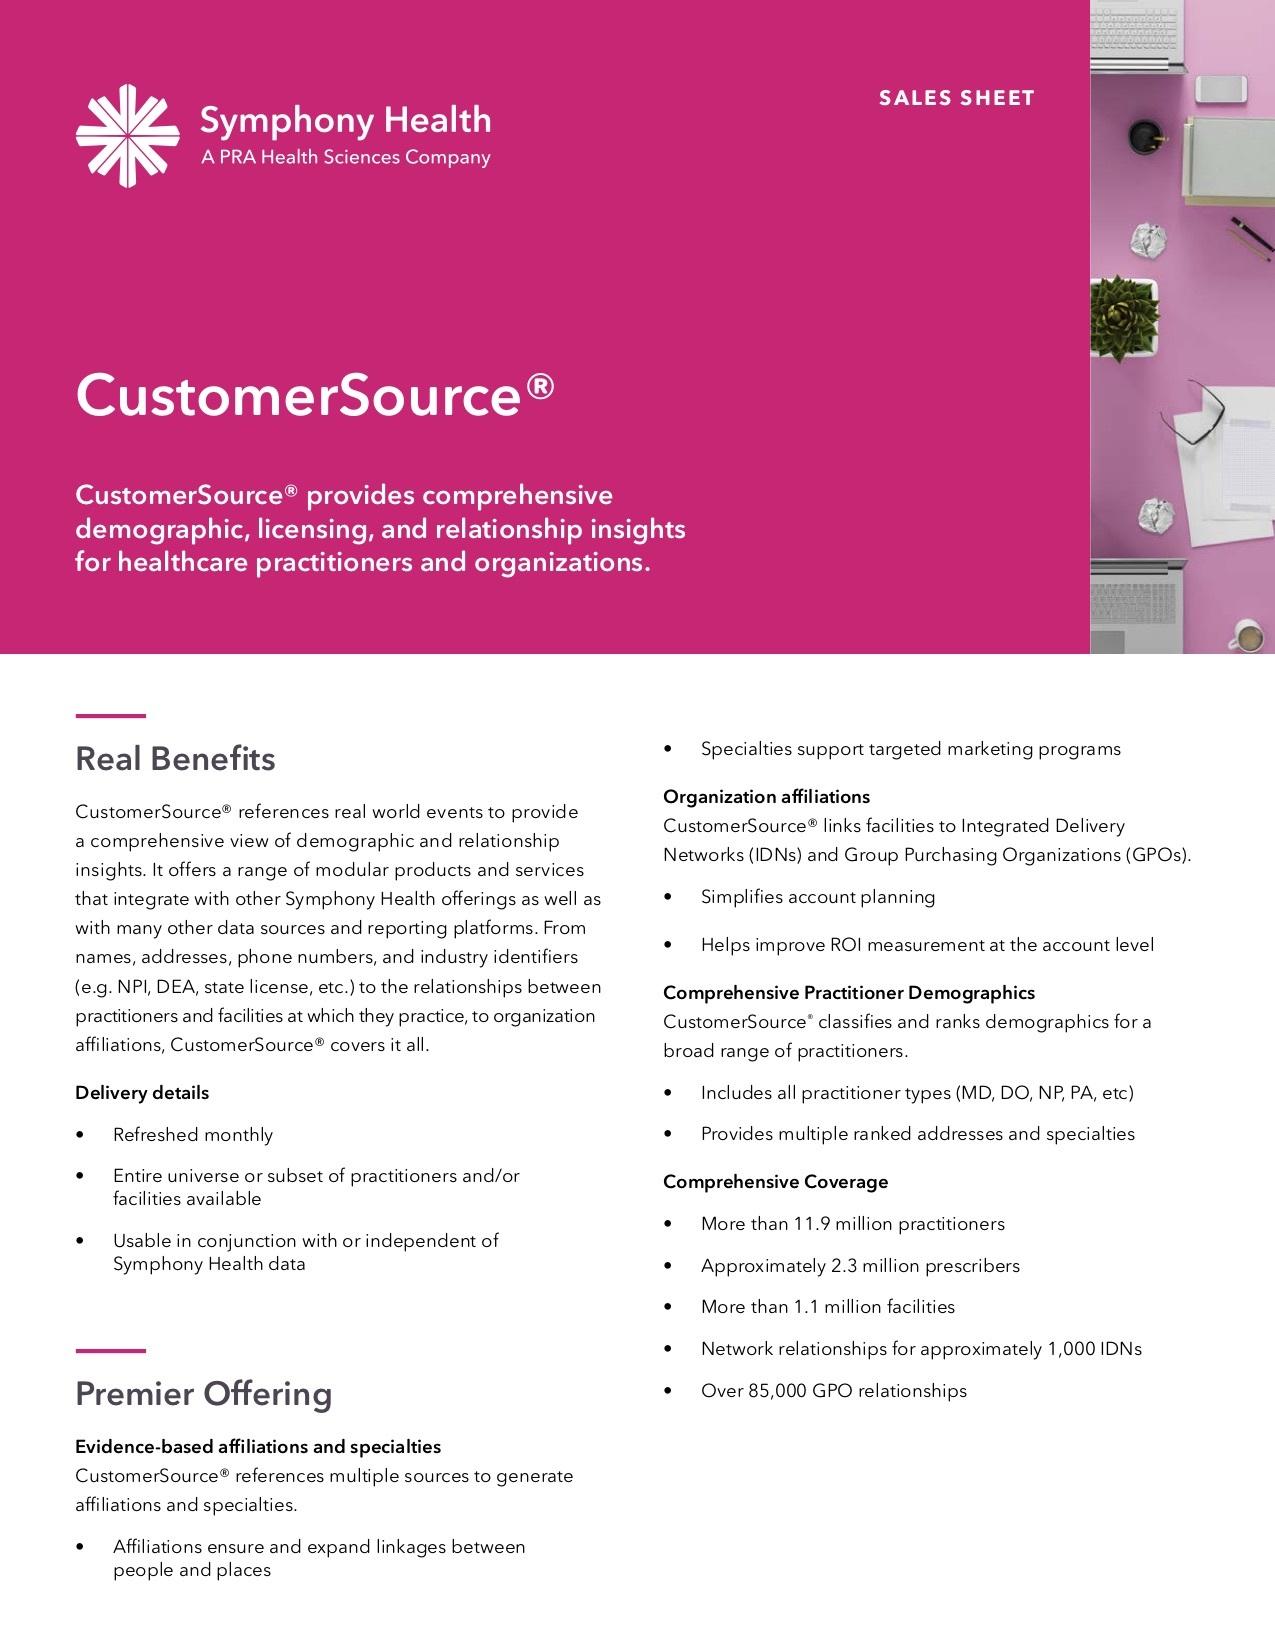 CustomerSource® Sales Sheet